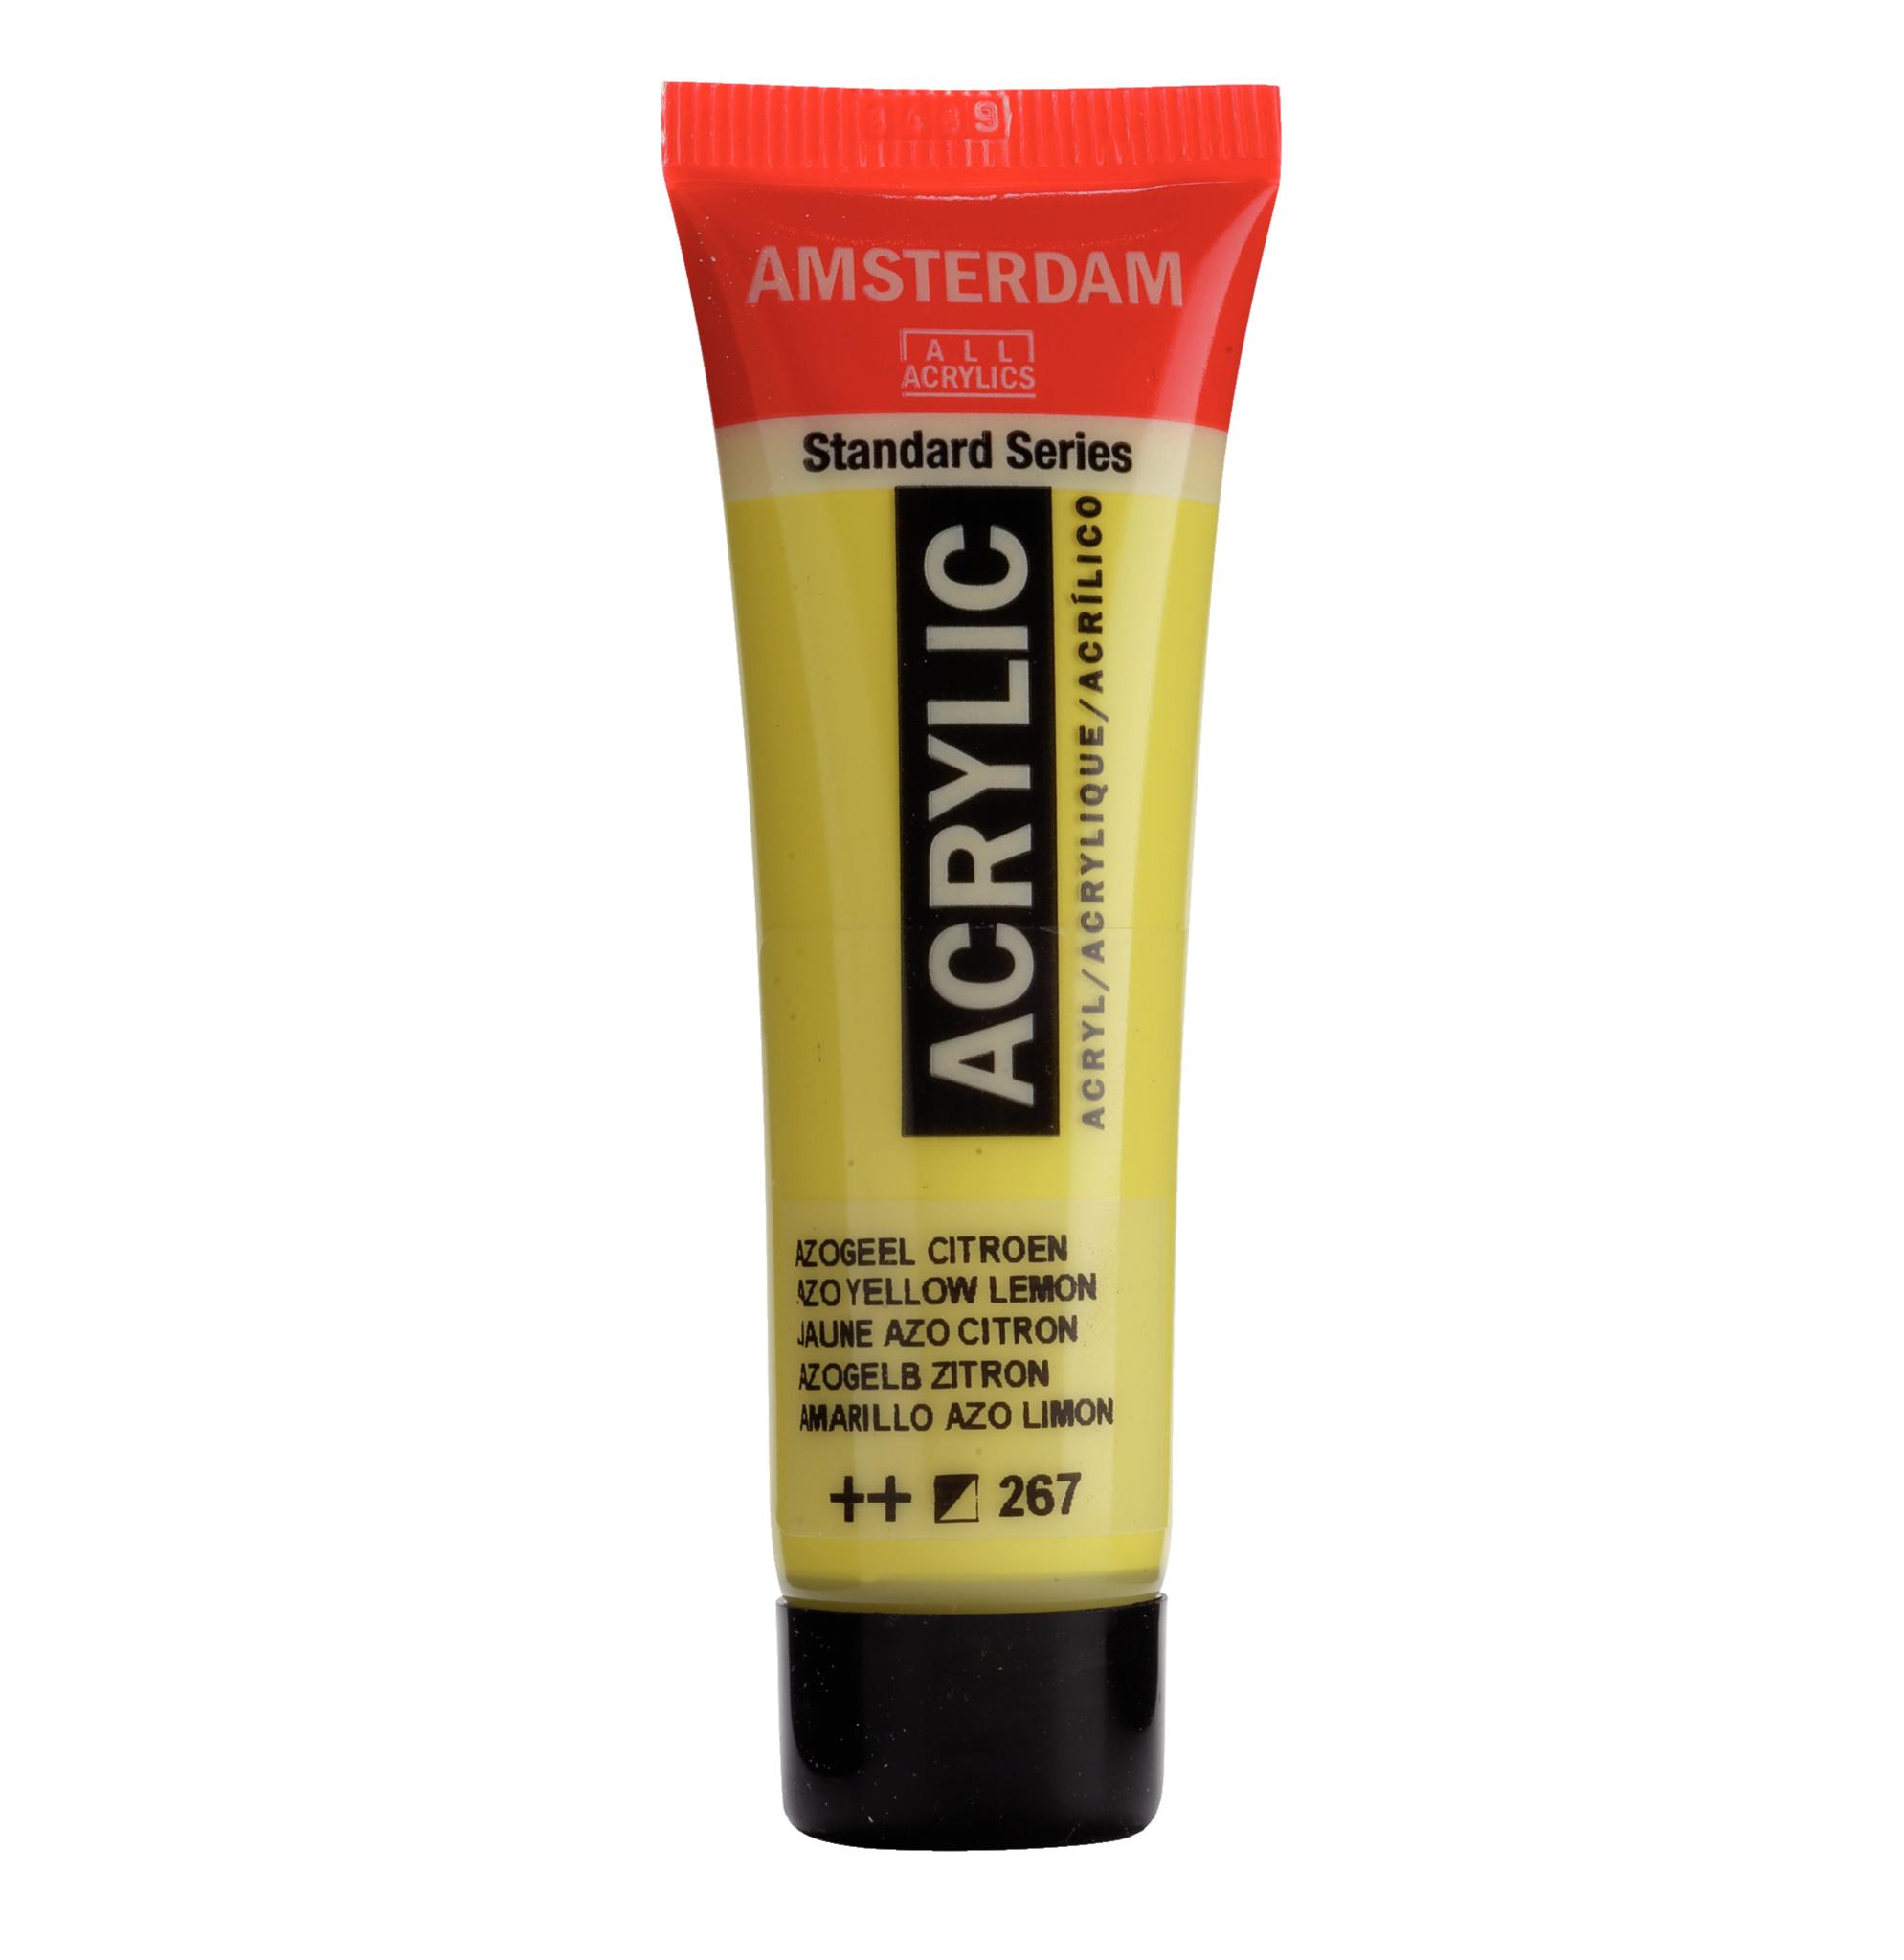 Acrylverf - Azo geel citroen - 267 - Amsterdam - 20ml